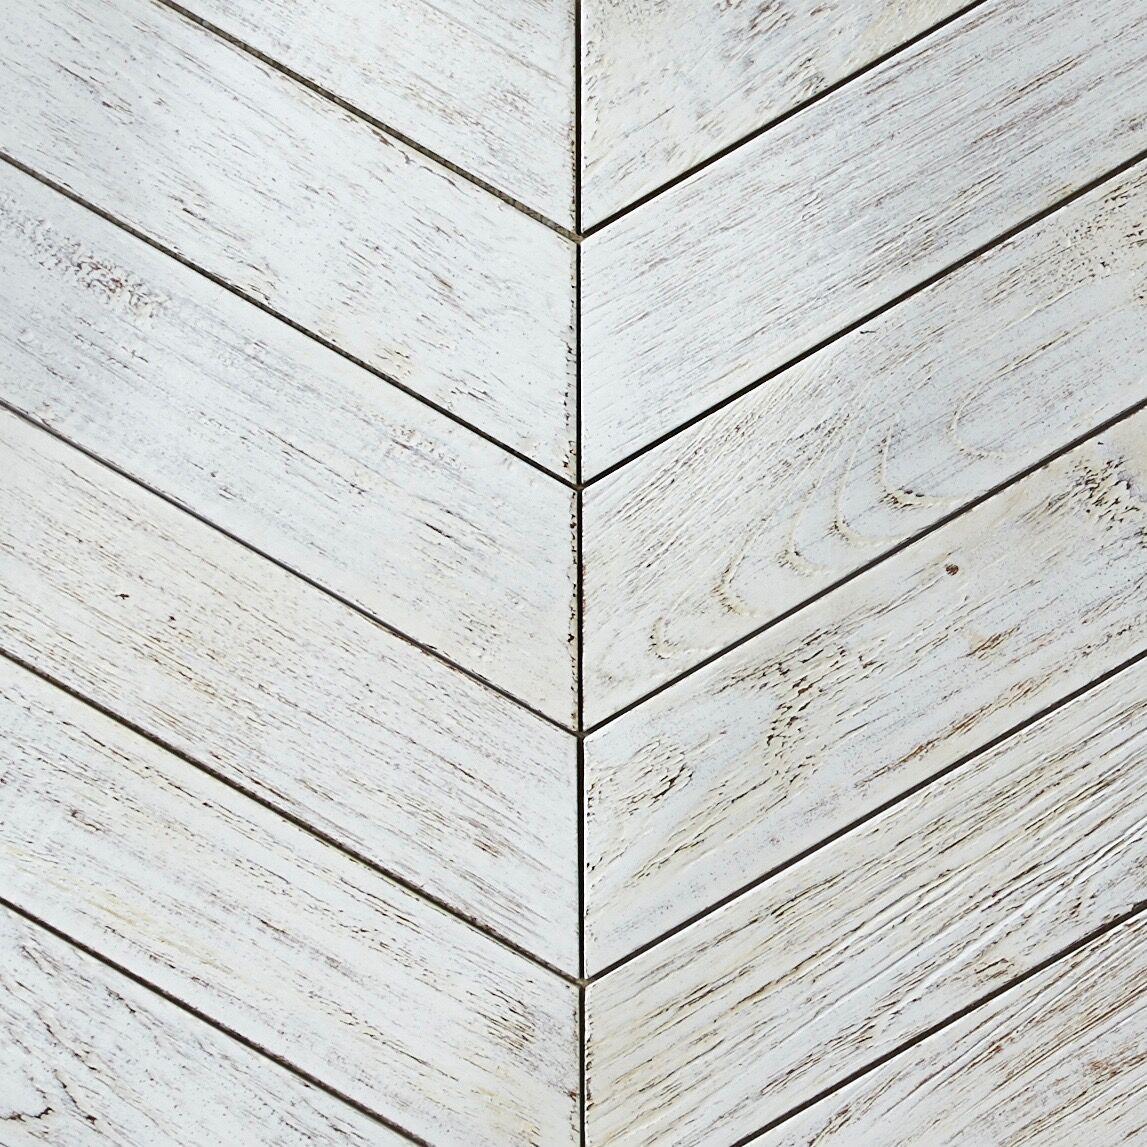 white resin finish - Teak Tile - Chevron